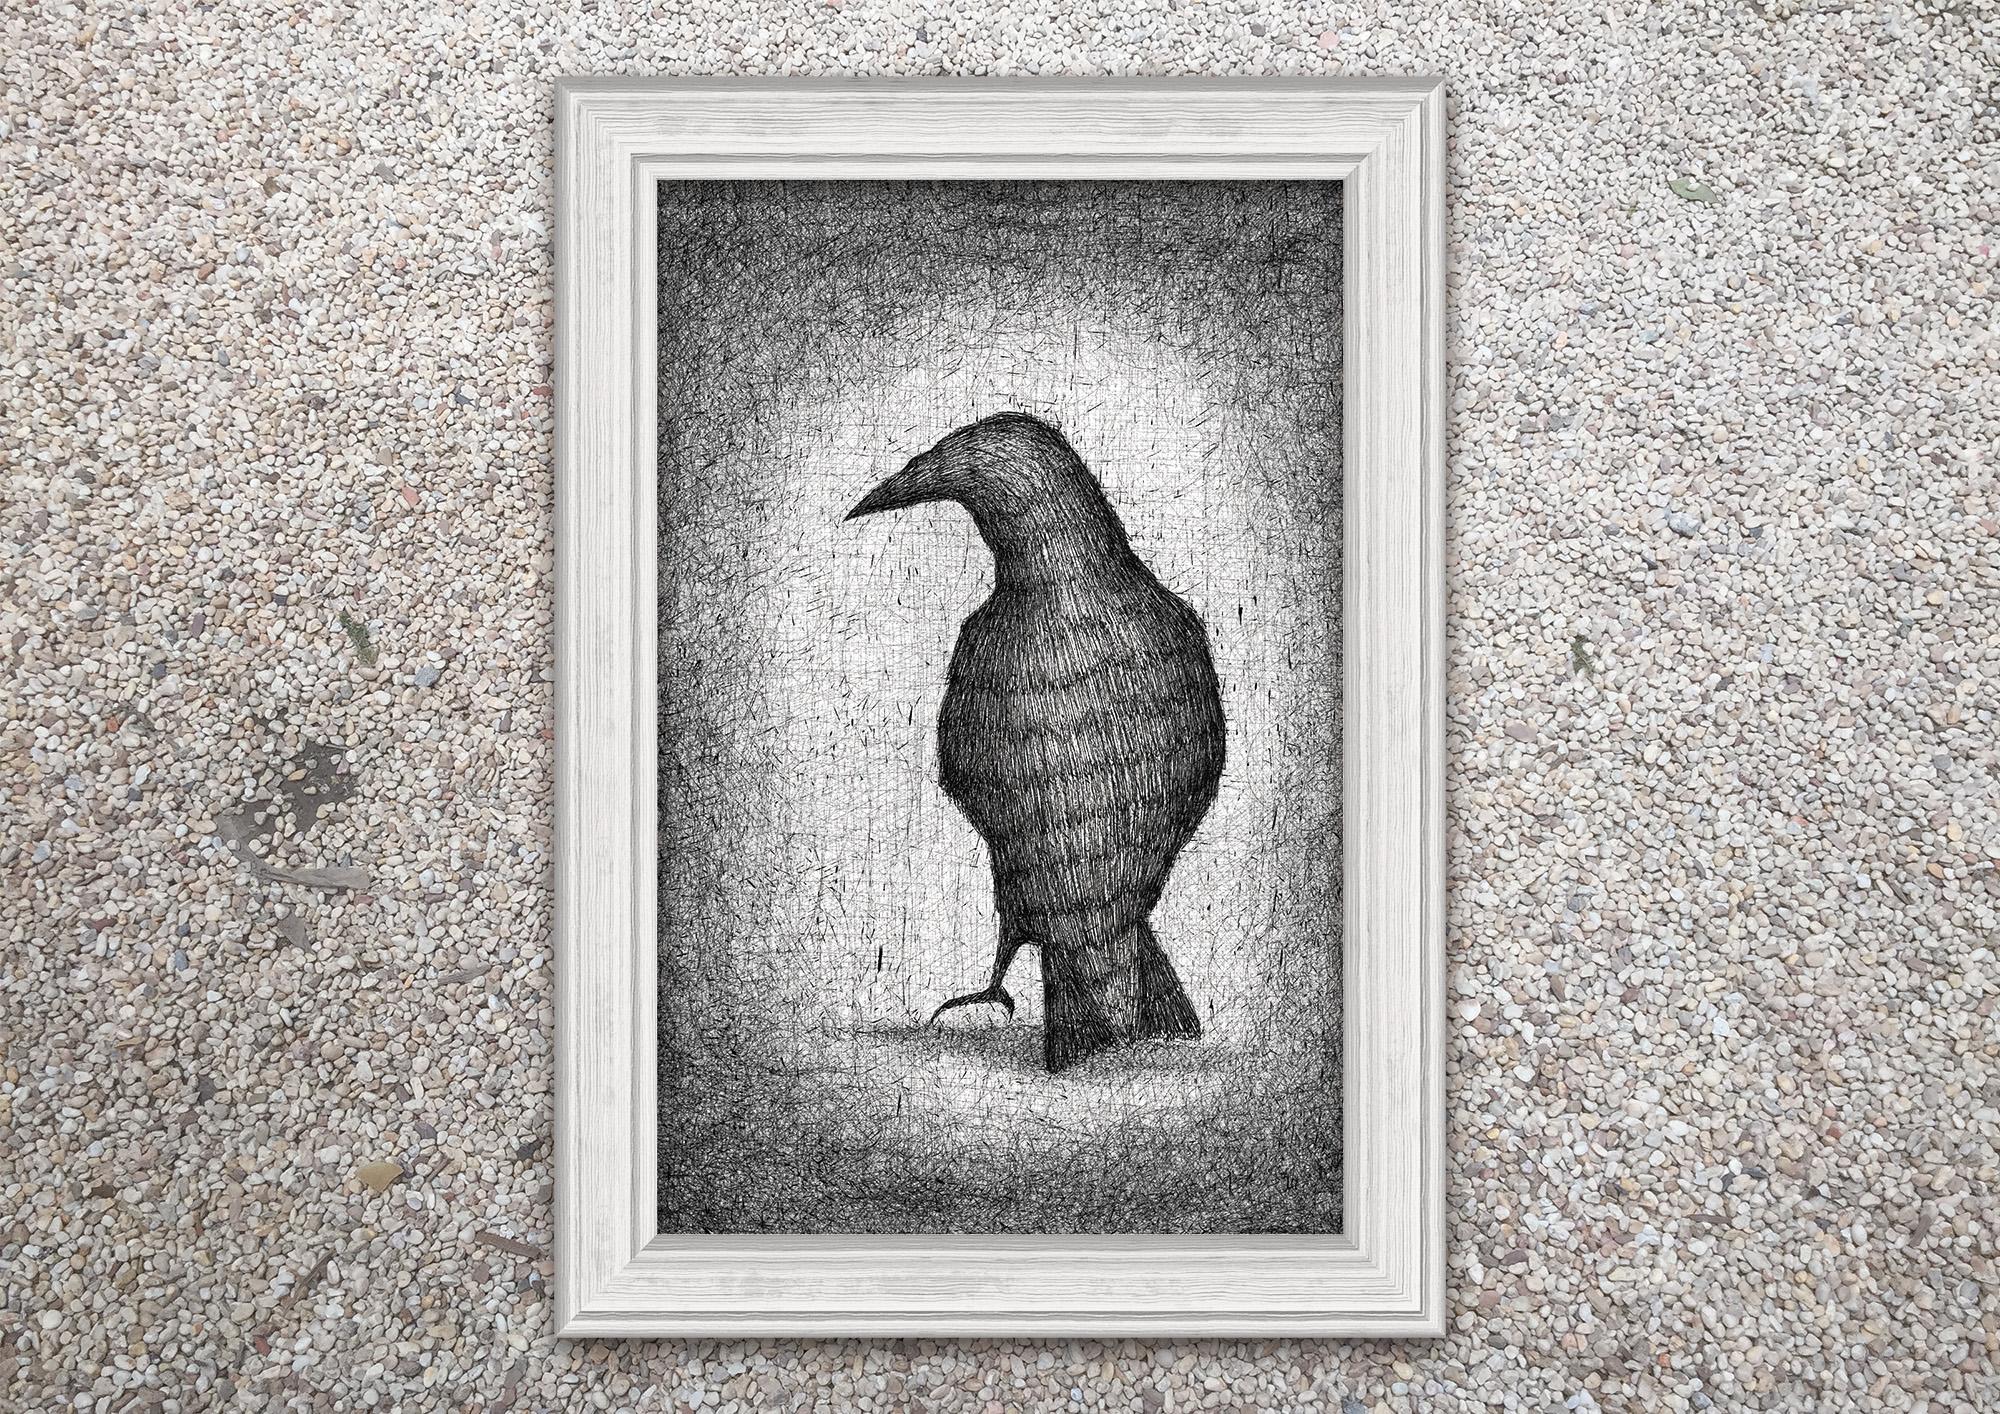 崩潰世代寓言-昏鴉 Bomb Generation-Dusk Crow